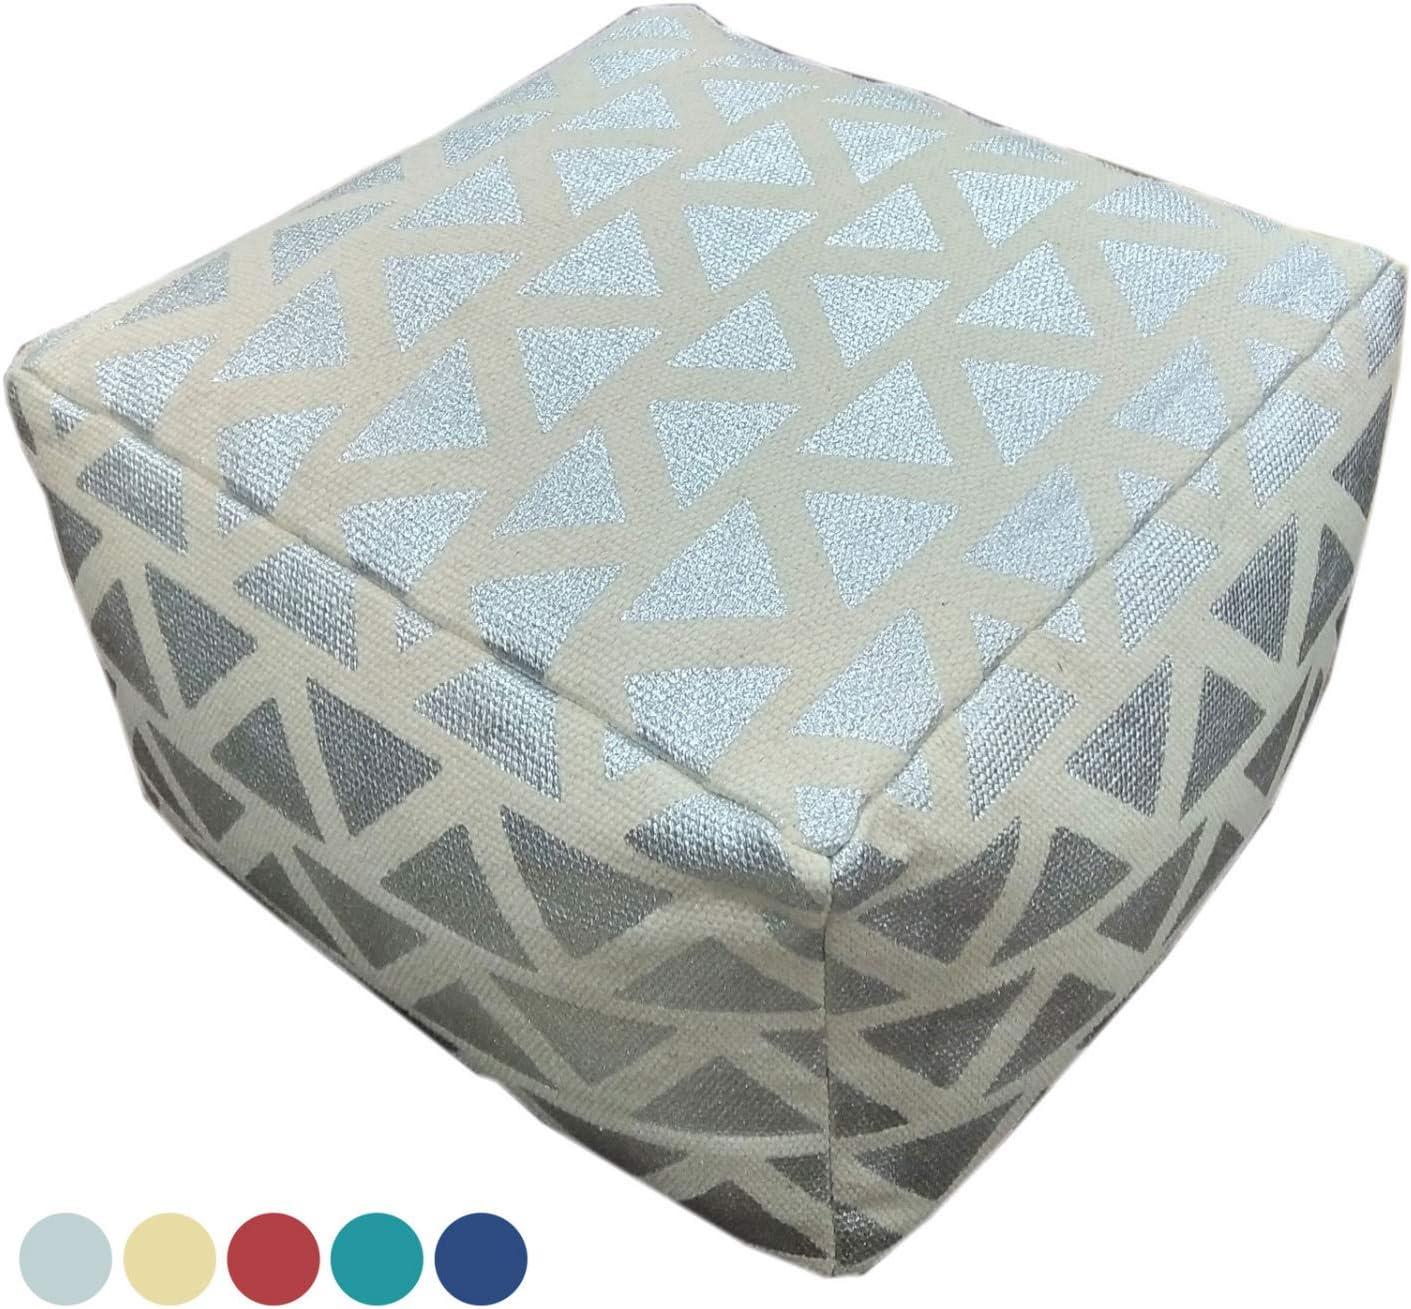 casamia Sitzhocker Sitzwürfel 55x37x55 cm Fußhocker Bodenkissen Design Pouf Kelim Style Maja 5 Farben Farbe metallic Silber